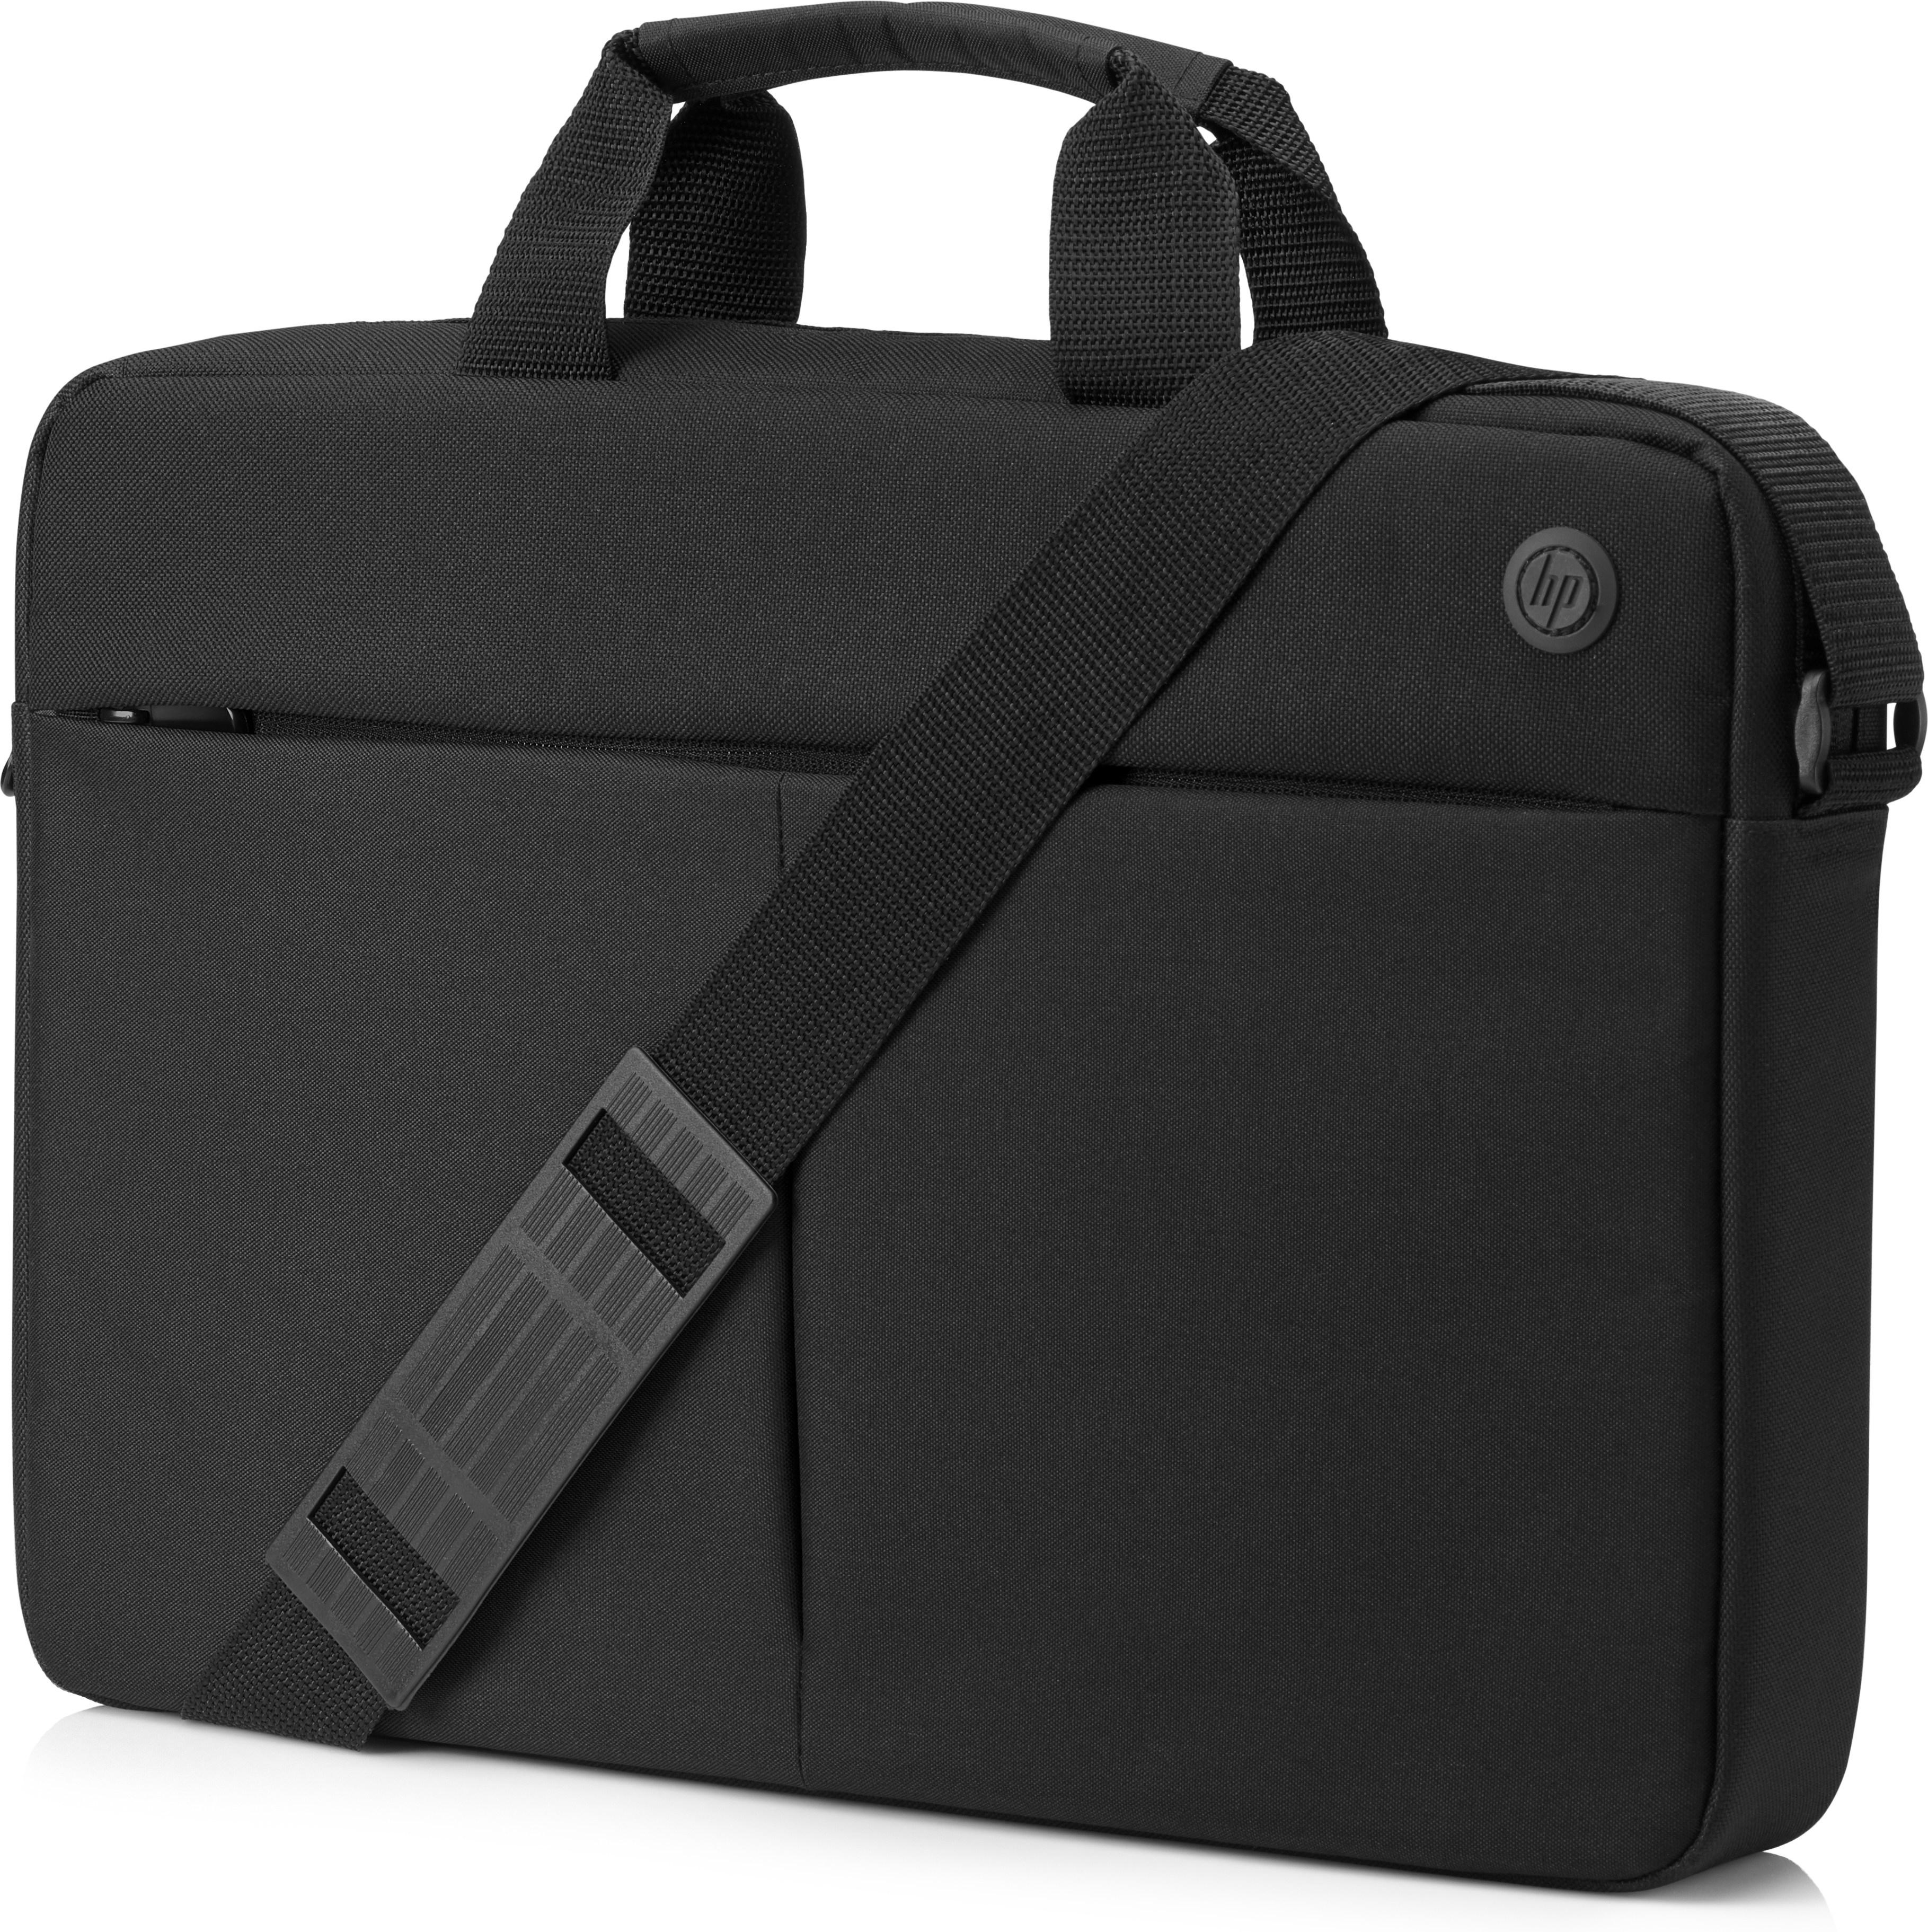 26b8b1c39a429 Hewlett Packard (HP) HP Prelude Top Load 39